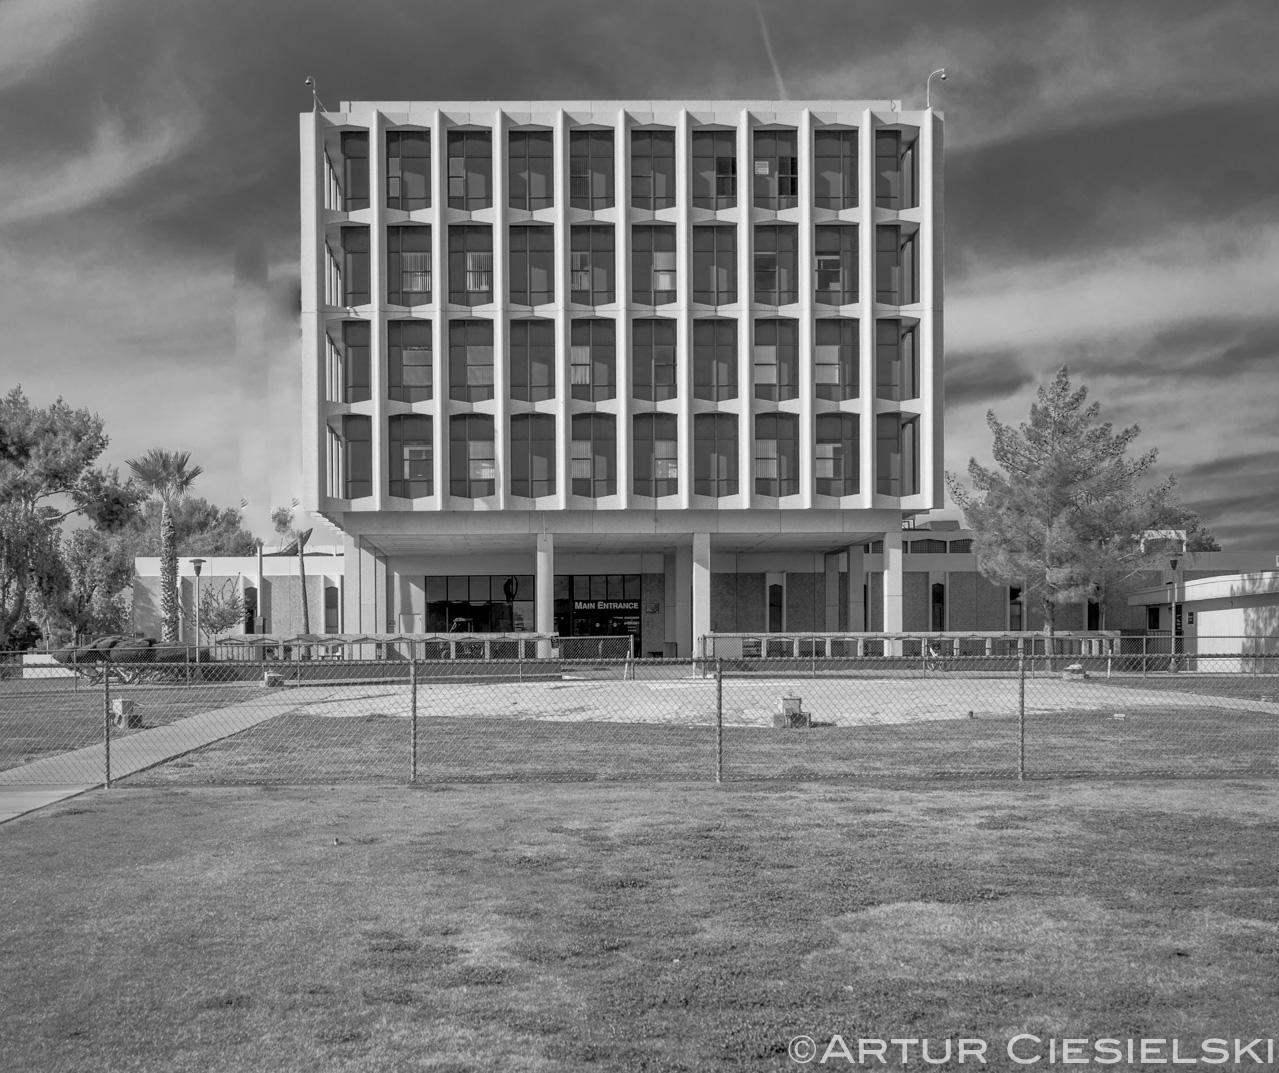 Random Photo Indian Medical Center The Blog Of Artur Ciesielski